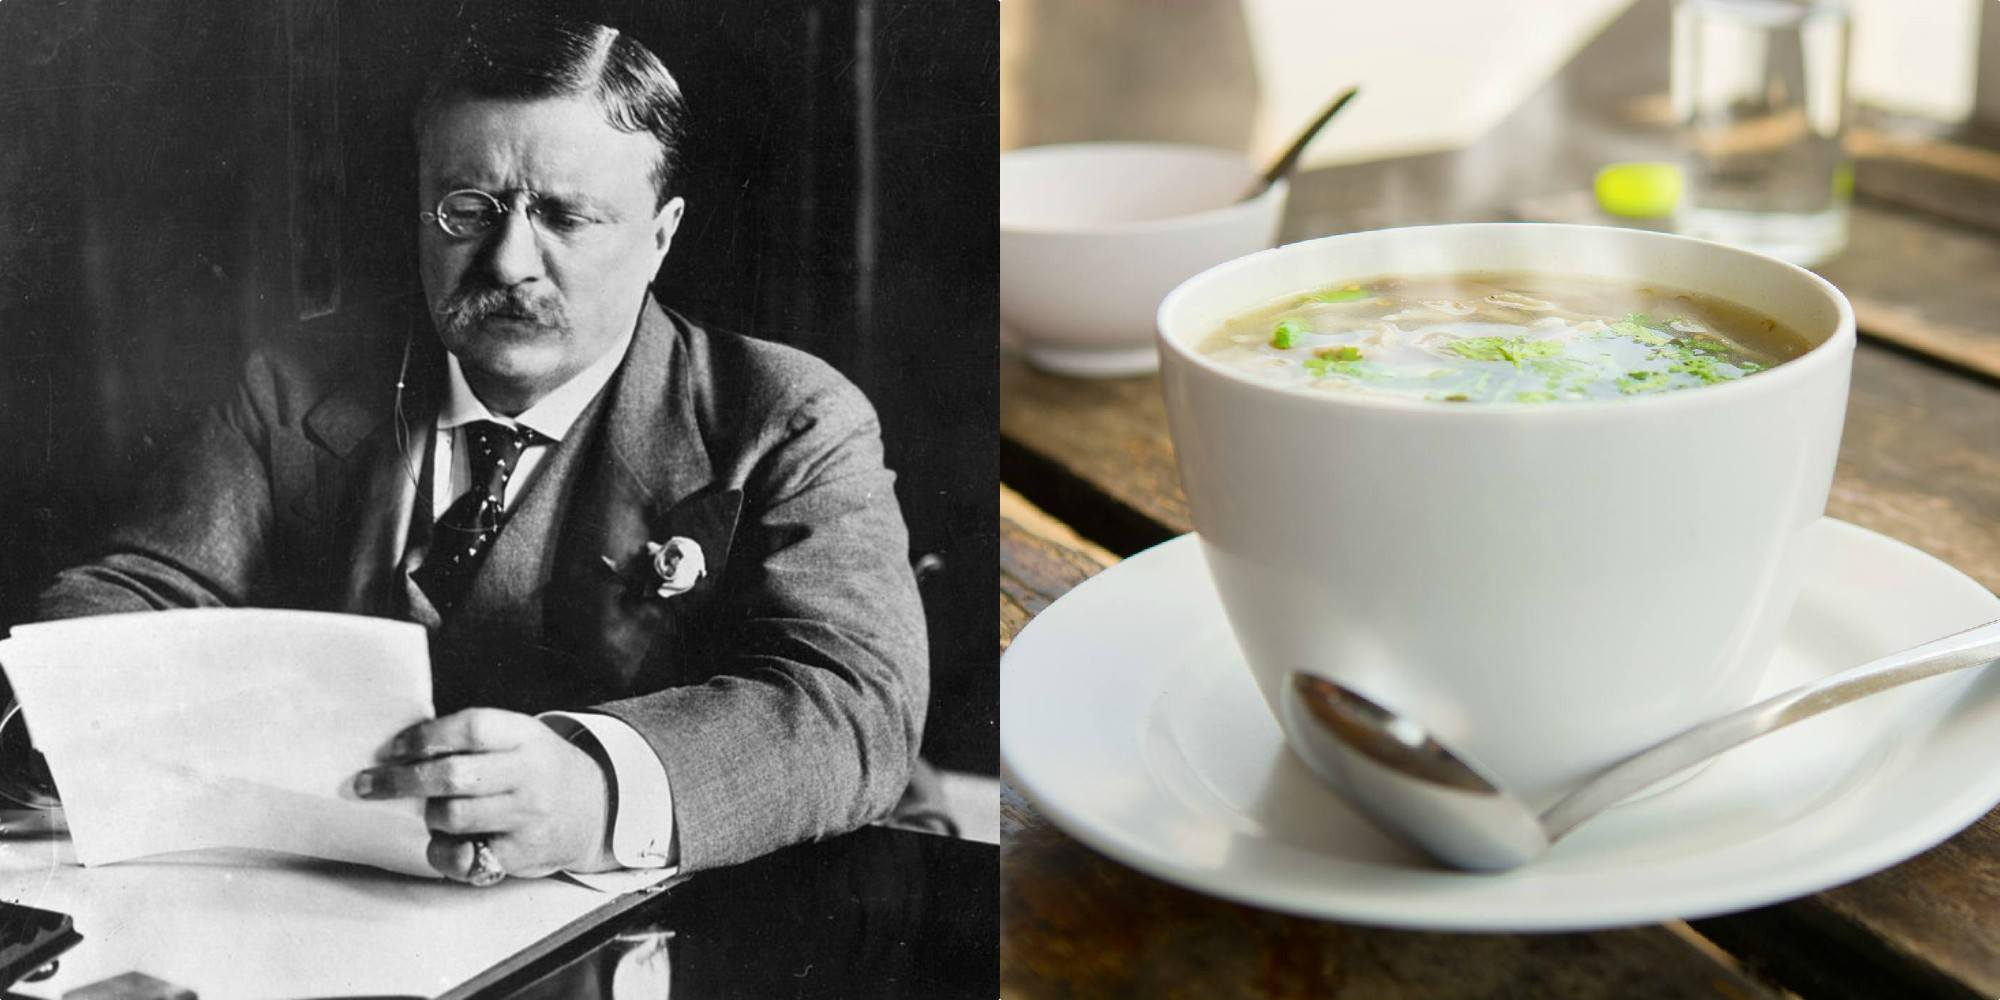 Teddy-Roosevelt-Soup